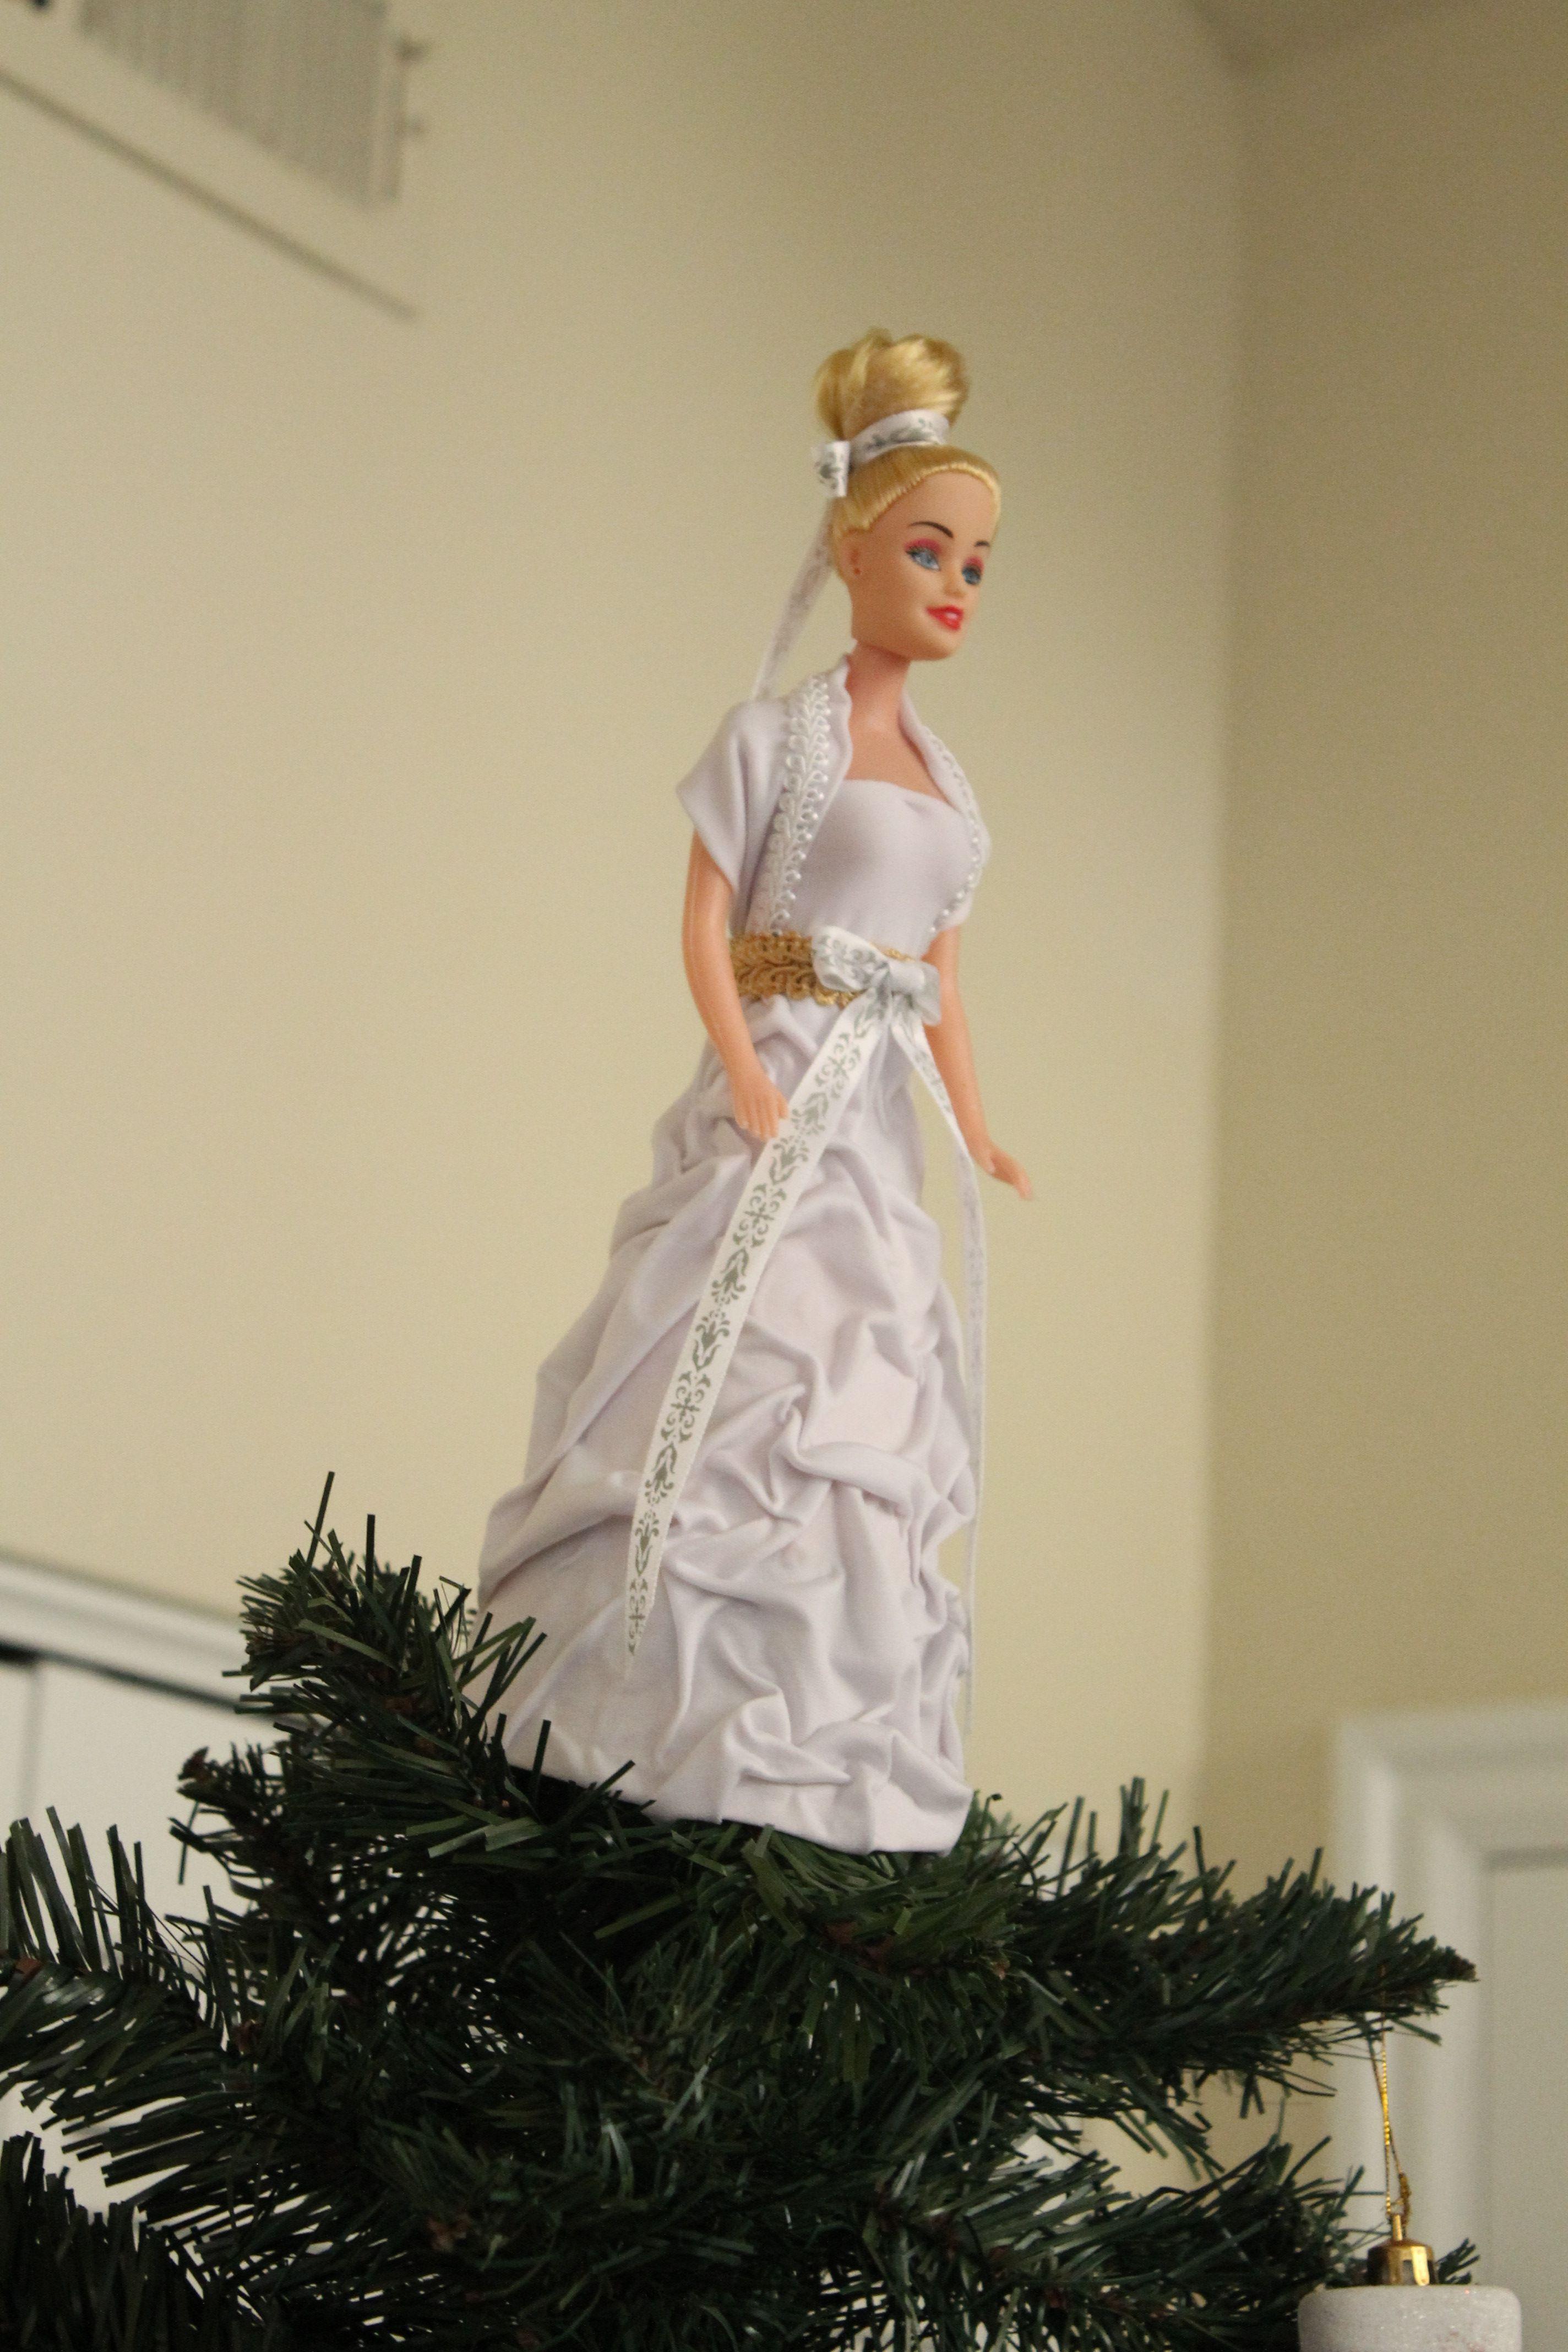 Fiber optic wedding dress  diy angel topper  Christmas  Pinterest  Diy angels and Craft